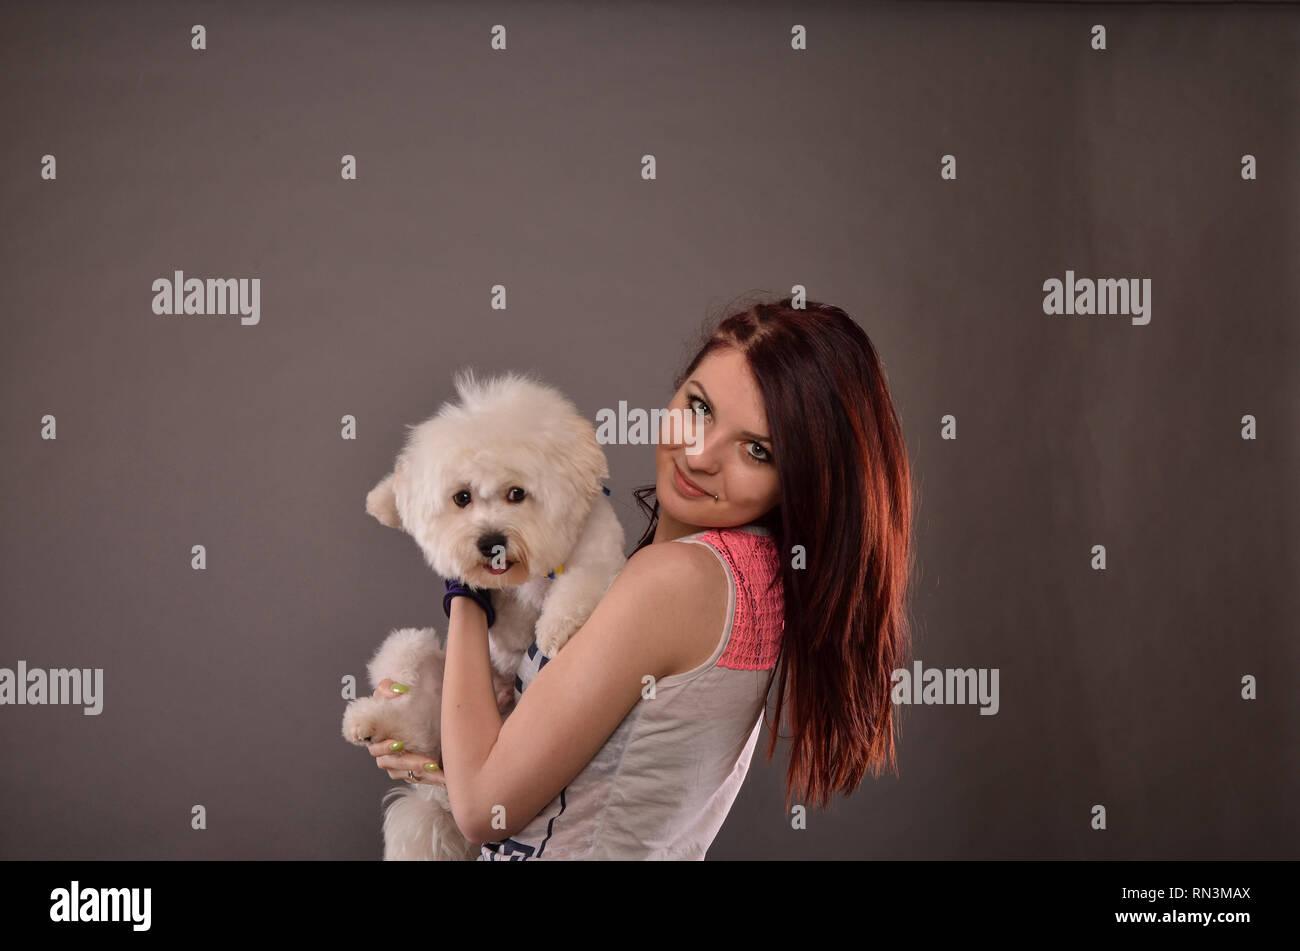 Cute redhead teenage girl holding Maltese puppy, studio shot against gray background - Stock Image